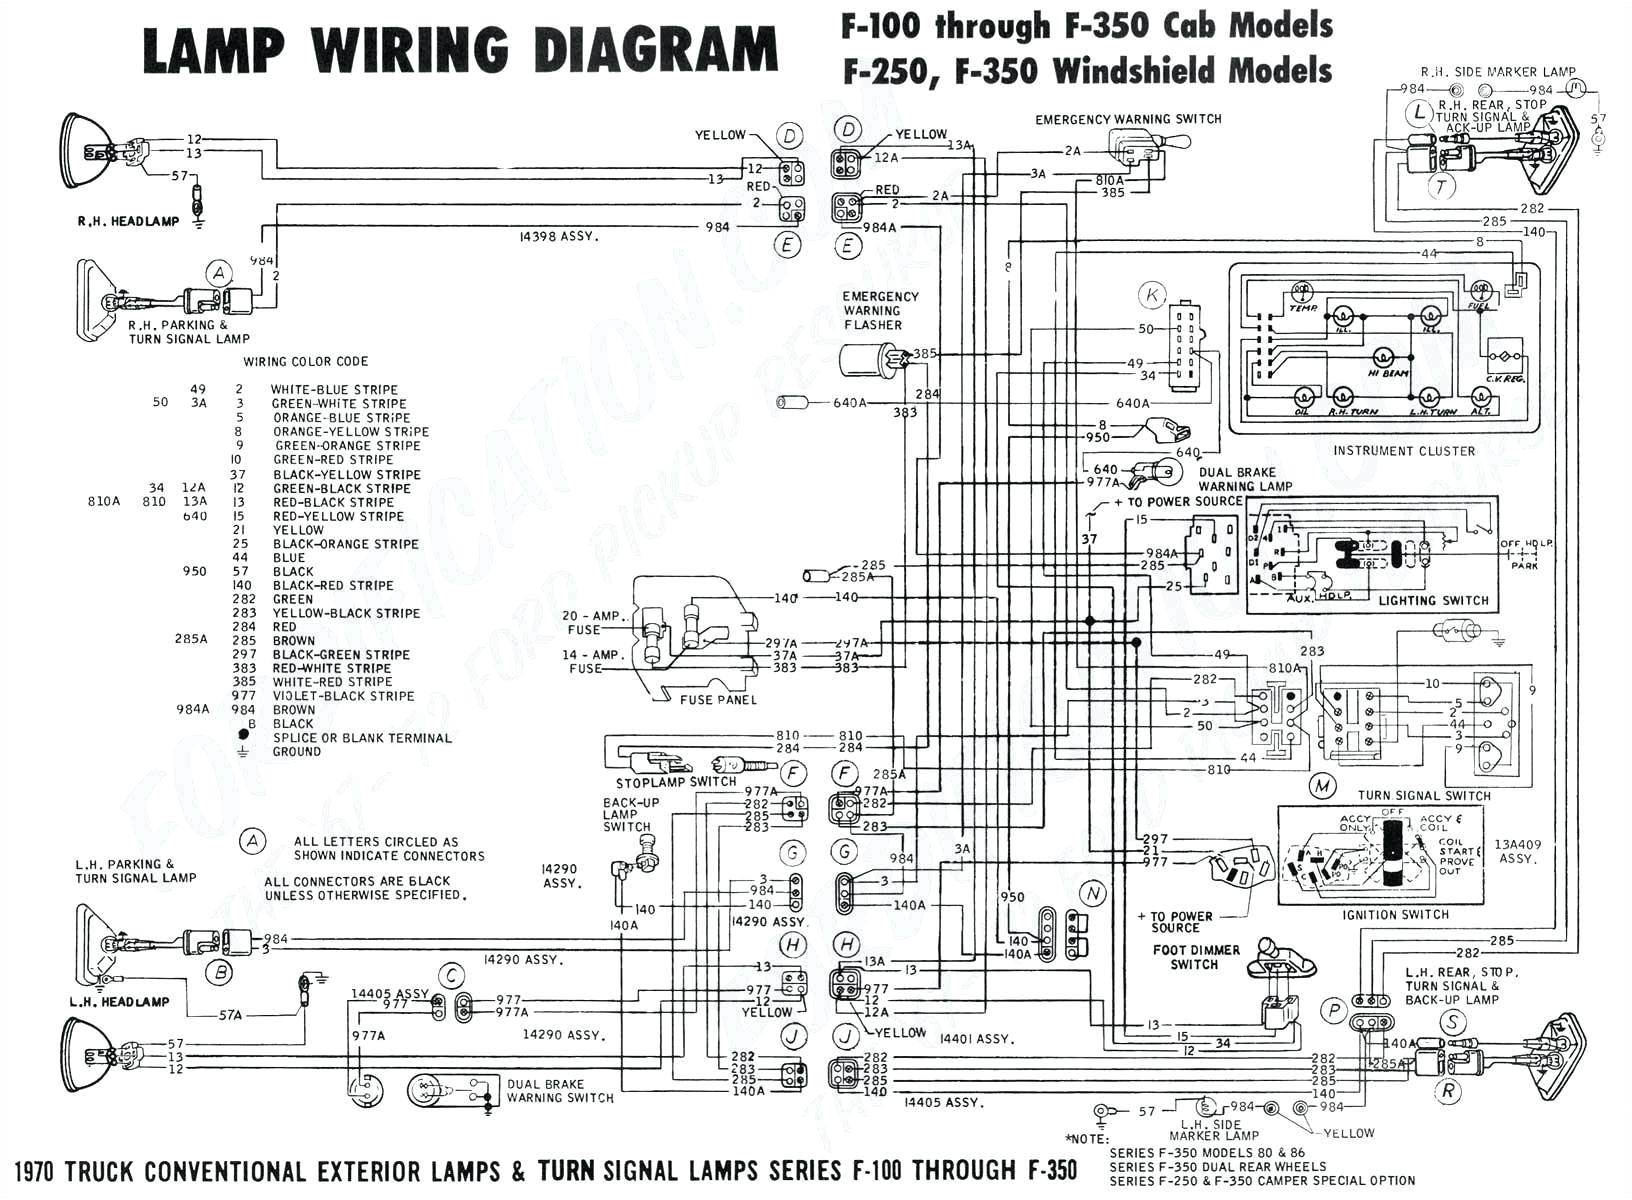 m813 wiring diagram wiring diagram operations m813 wiring diagram wiring diagram preview m813 wiring diagram